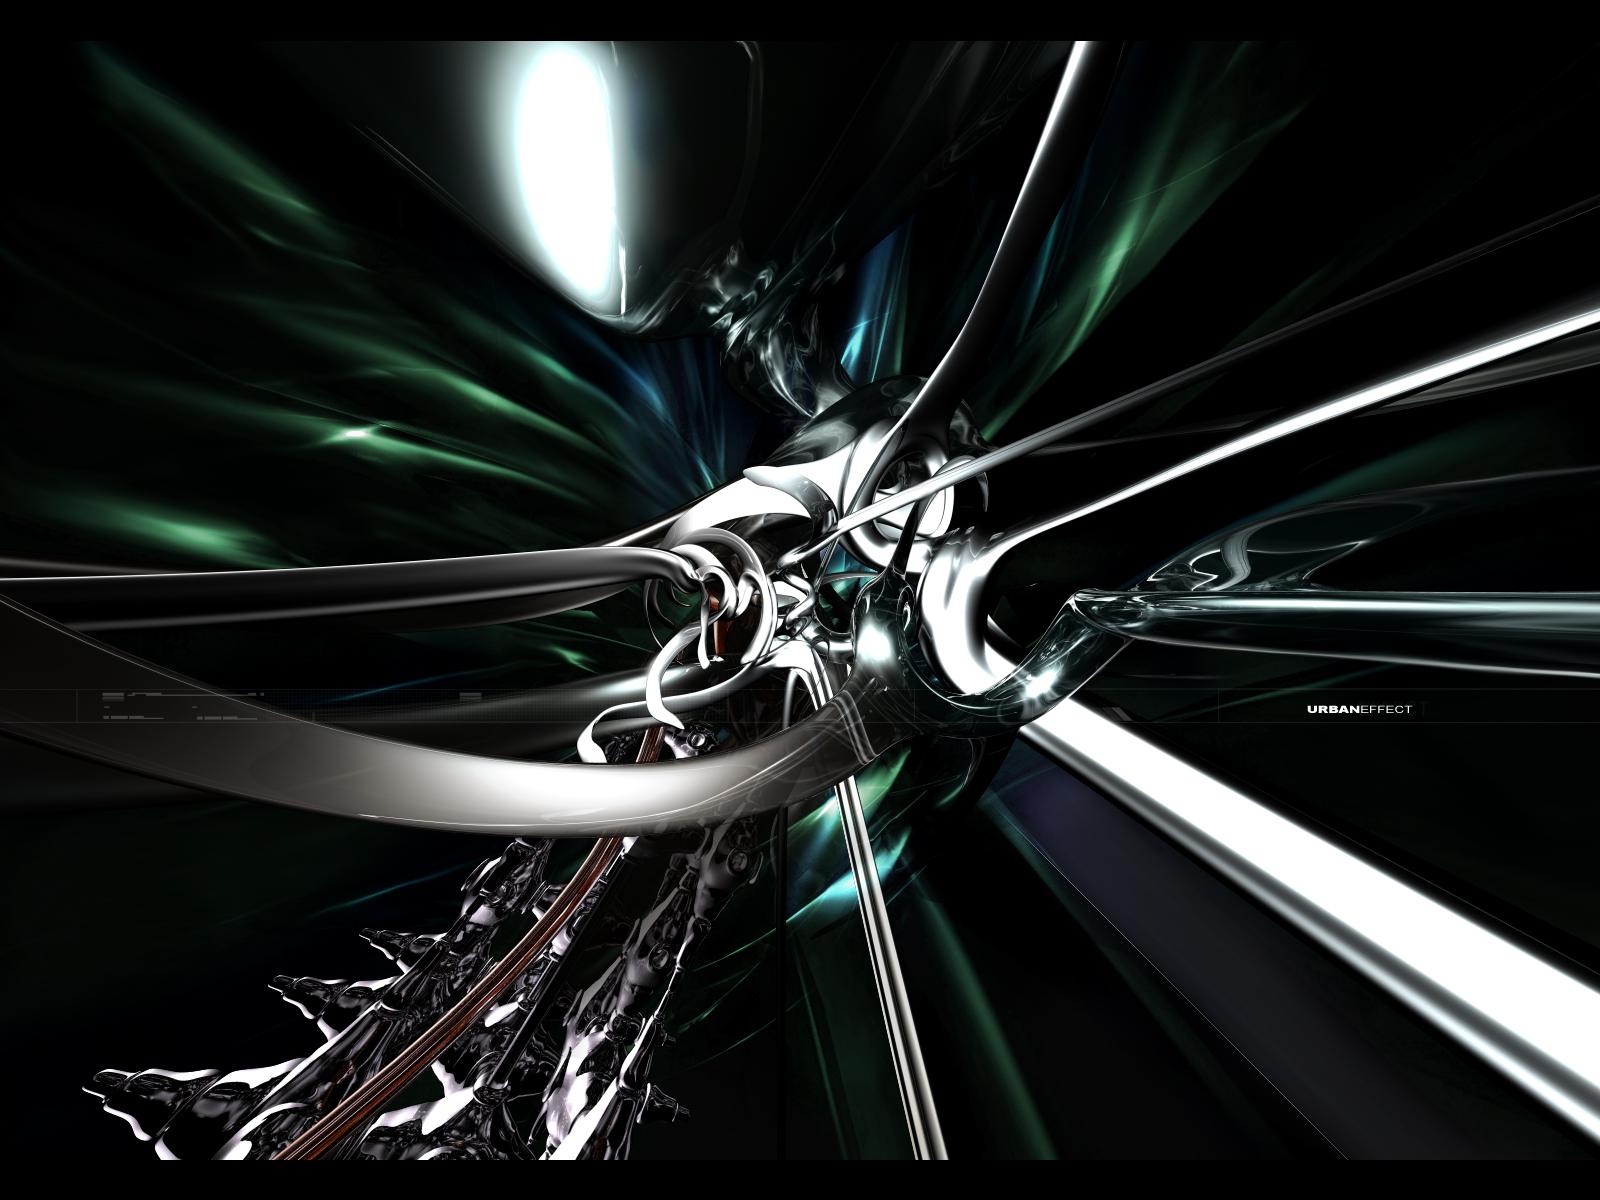 Imagenes abstractas hd taringa for Imagenes abstractas 3d